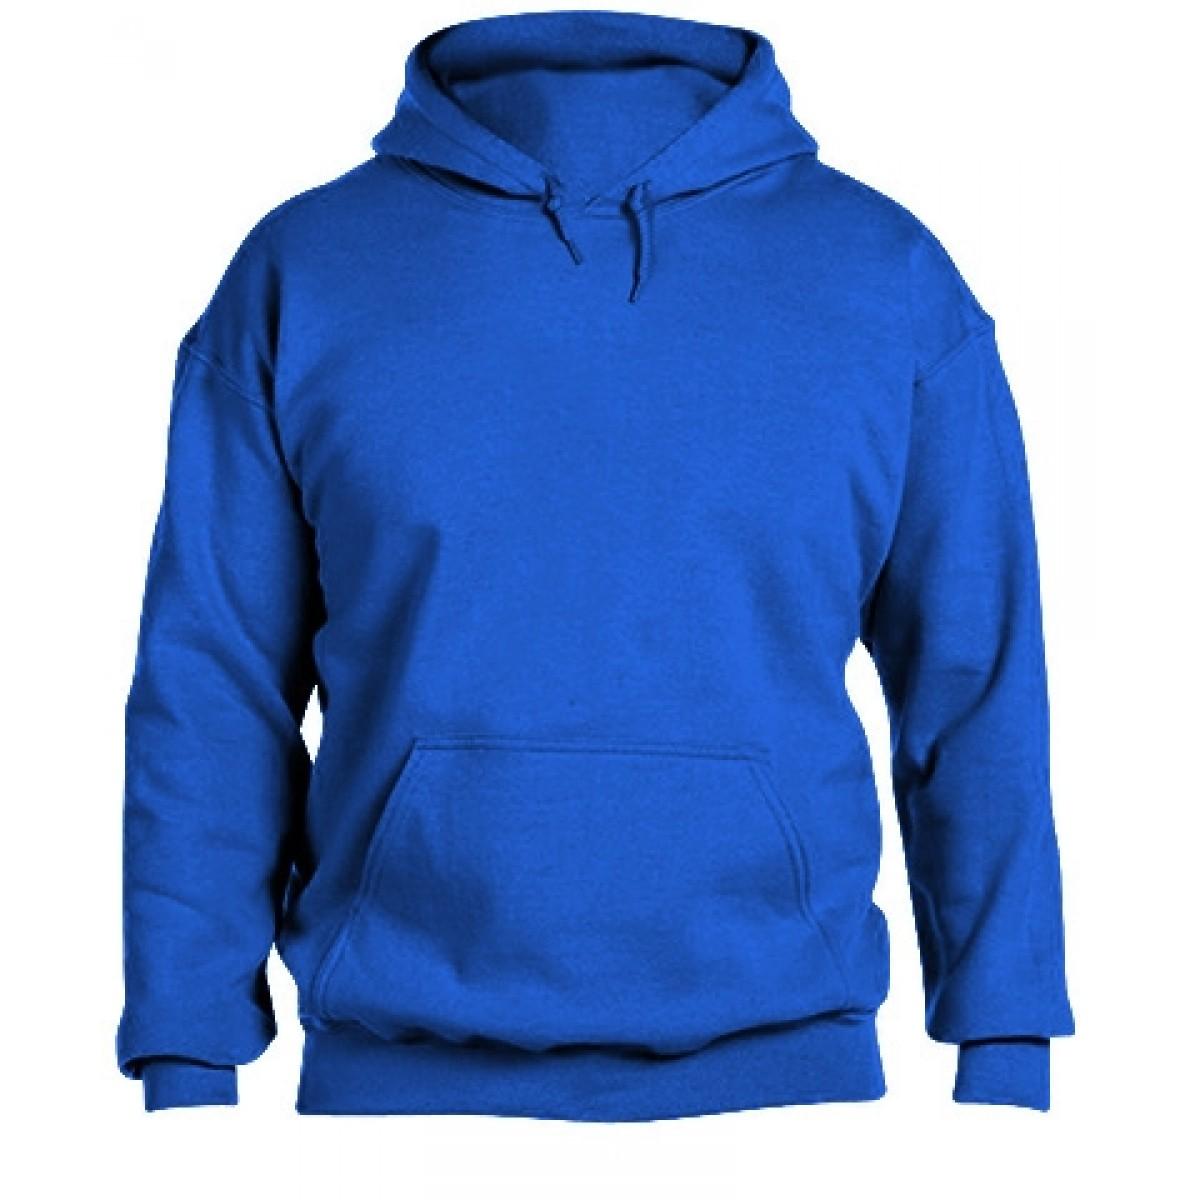 Solid Hooded Sweatshirt  50/50 Heavy Blend-Royal Blue-YM